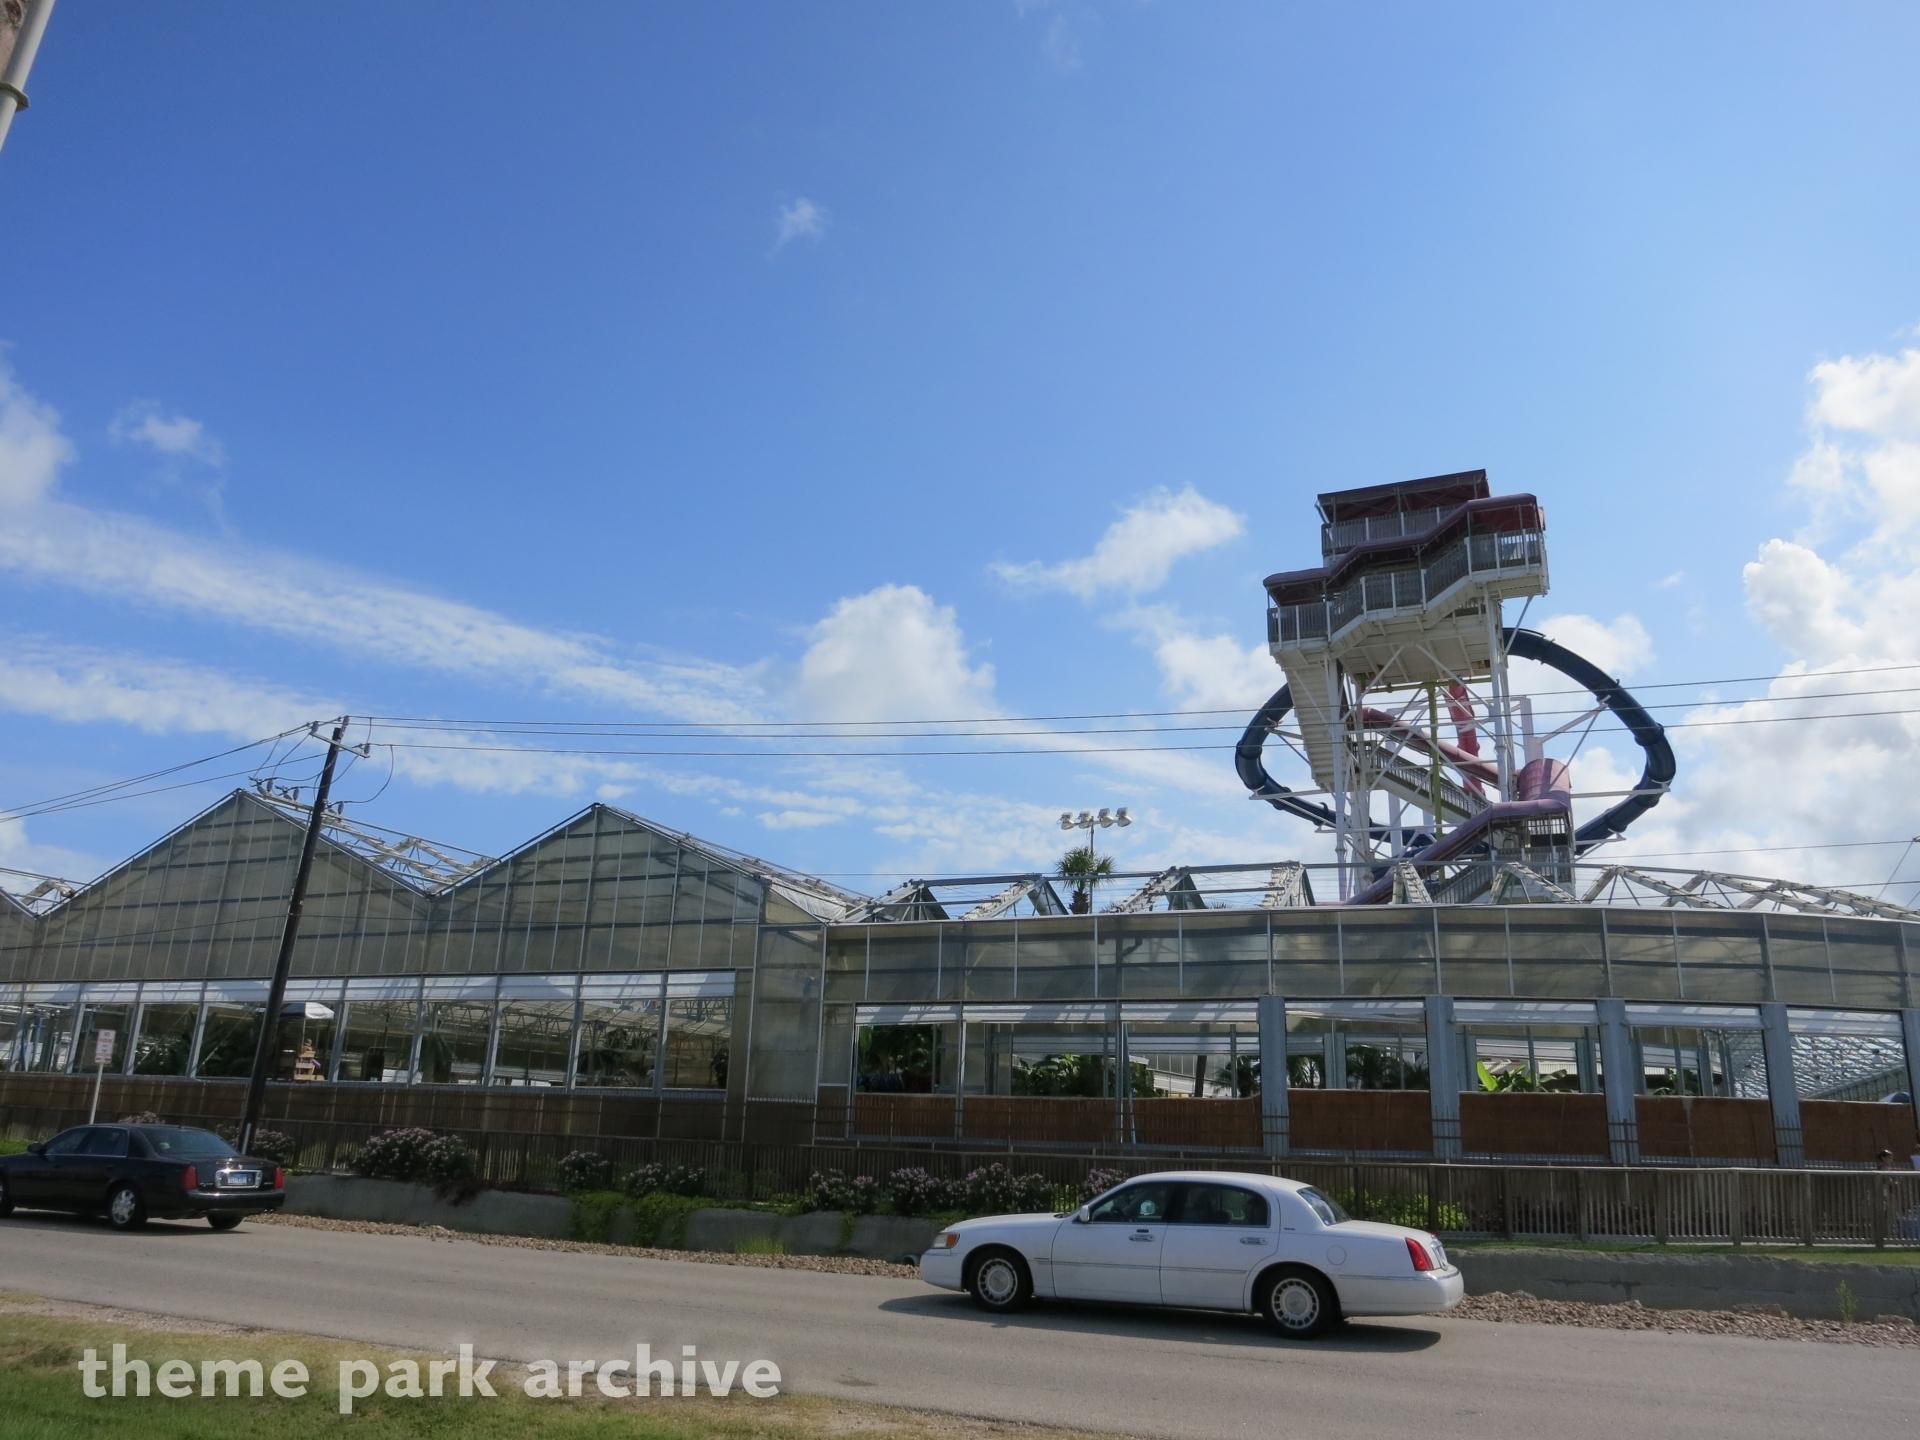 Wasserfest at Schlitterbahn Galveston Island